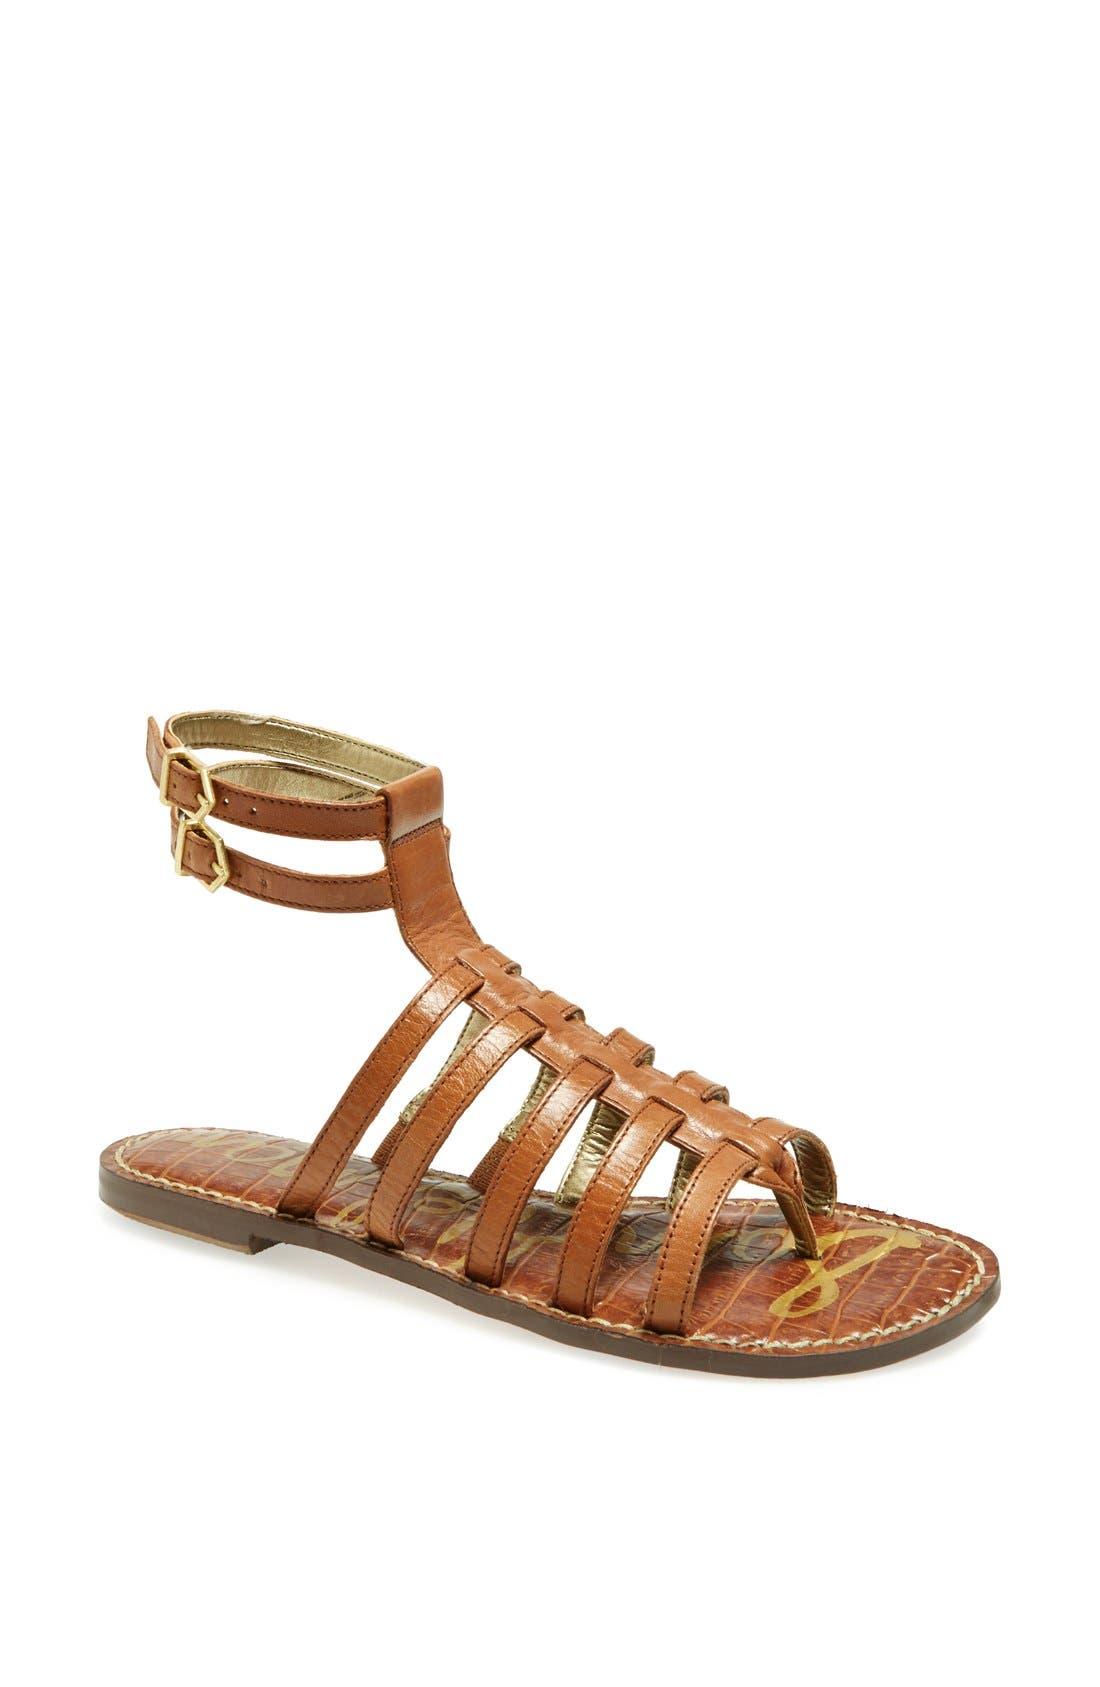 'Gilda' Sandal,                             Main thumbnail 1, color,                             Saddle Leather